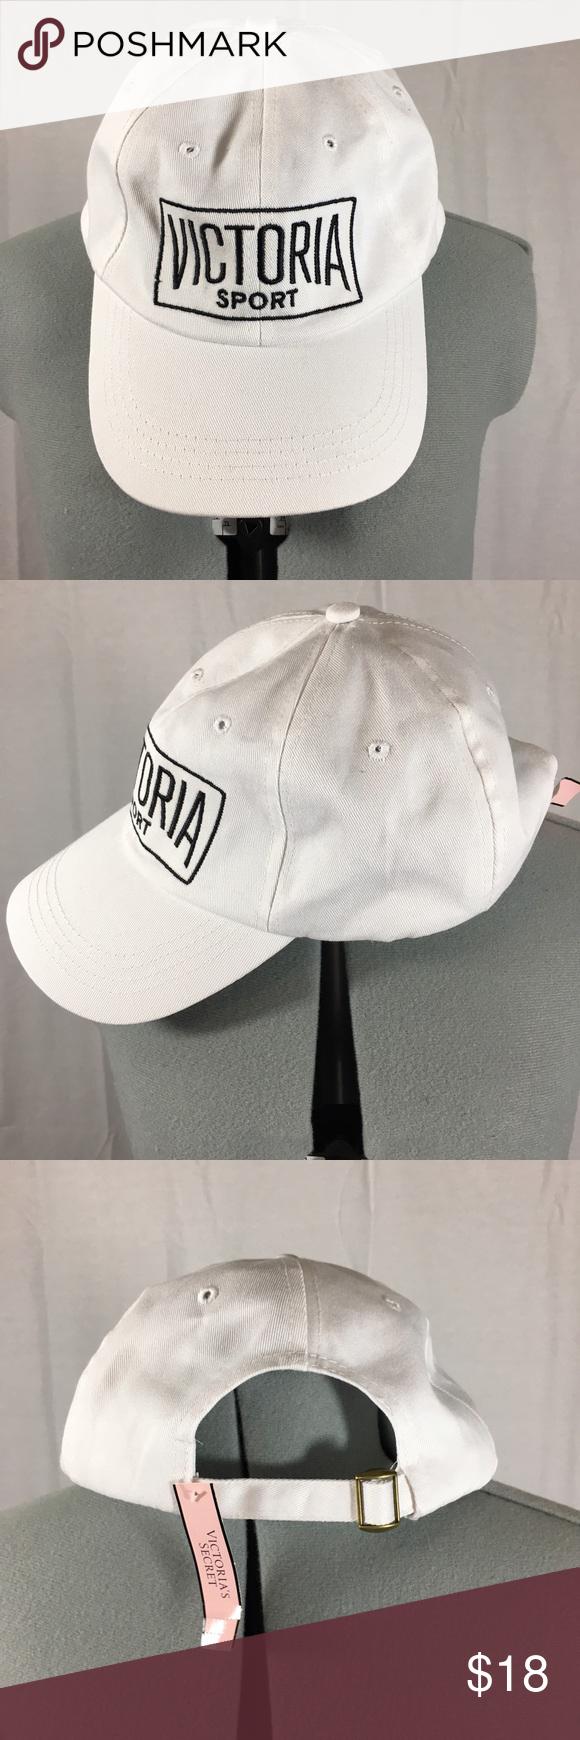 5877bffc4db Victoria s Secret Logo Hat VS Sport baseball